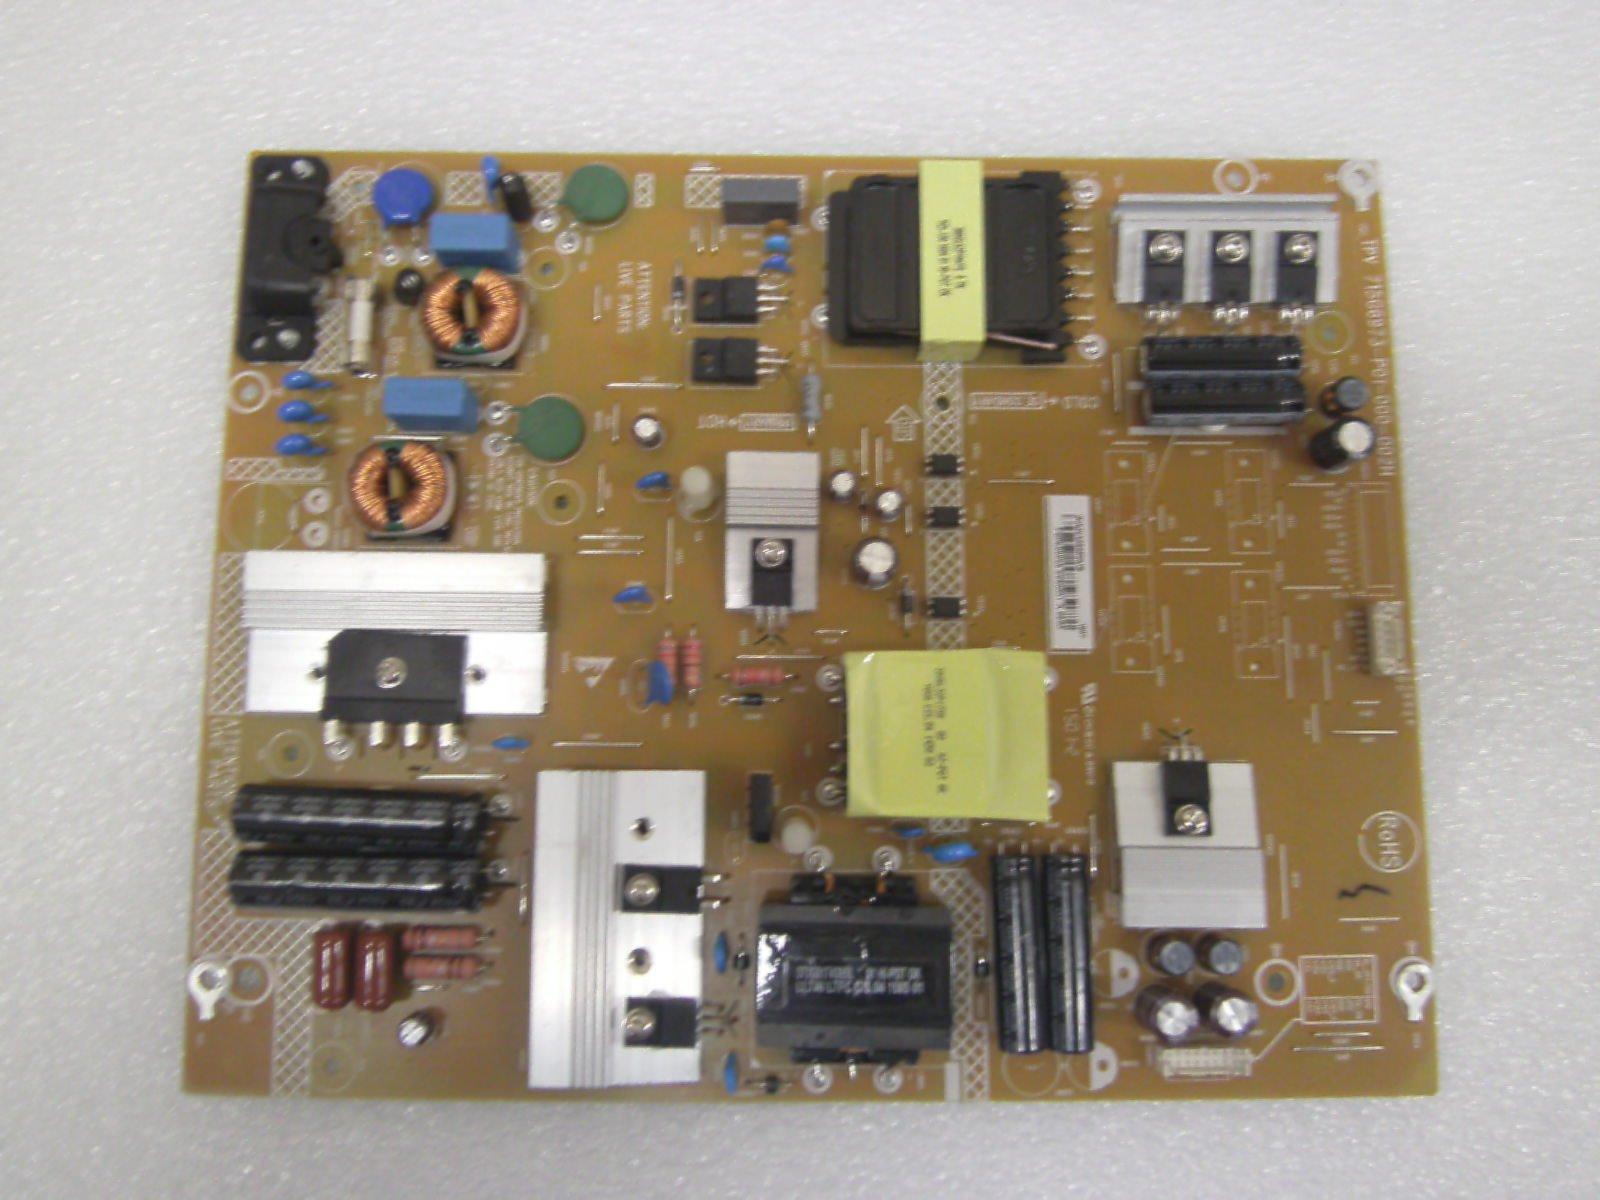 VIZIO E50-C1 715G6973-P01-000-002H (X)ADTVE2420AD4 POWER SUPPLY3246